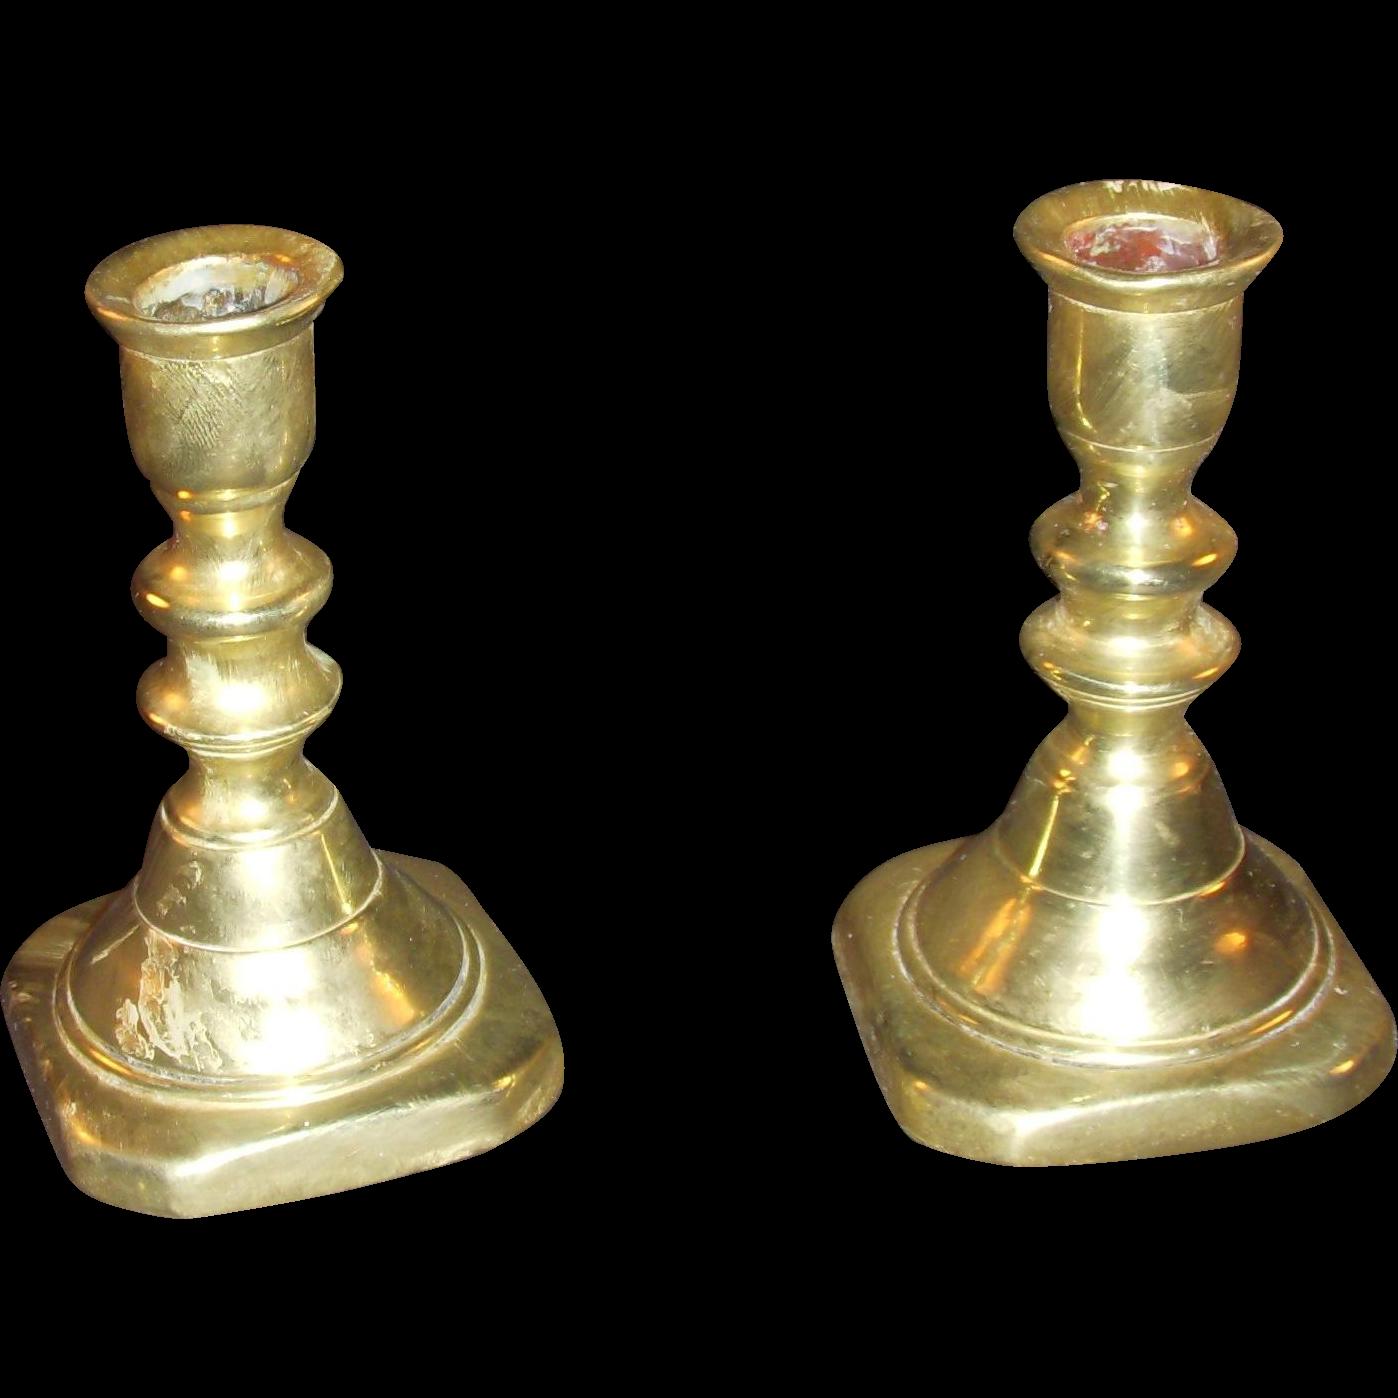 Brass Candlesticks victorian miniature brass candlesticks from albion-manor on ruby lane